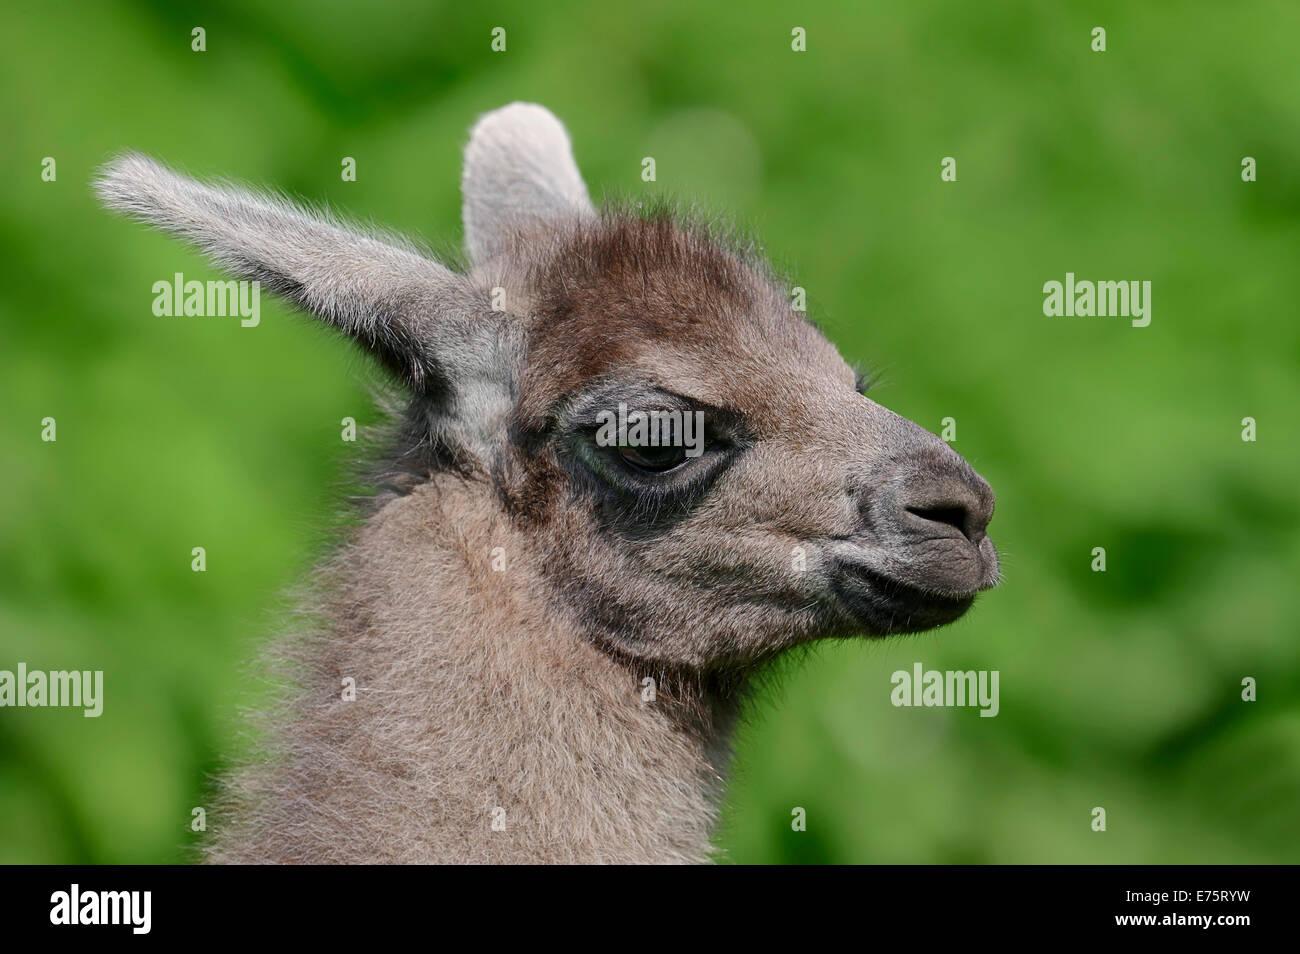 Llama (Lama glama), young, native to South America, captive, Germany - Stock Image